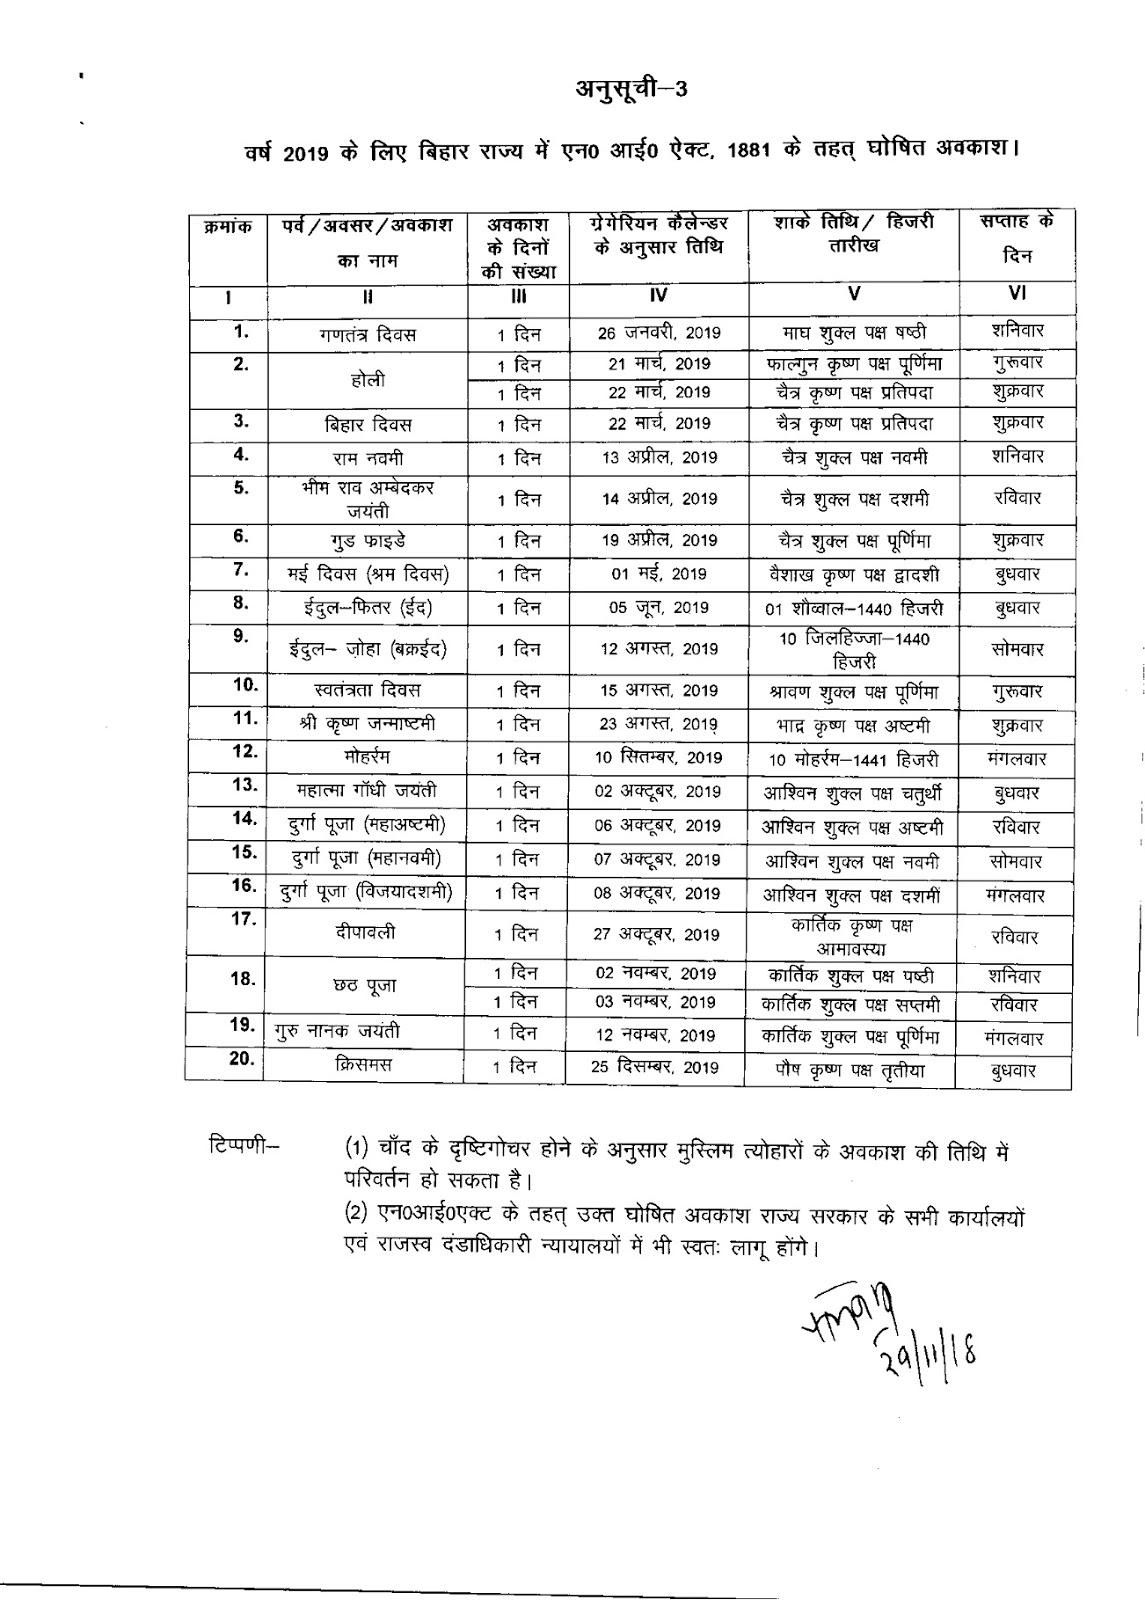 Bihar Government Calendar 2019 #educratsweb for Bihar Govt Calendar 2020